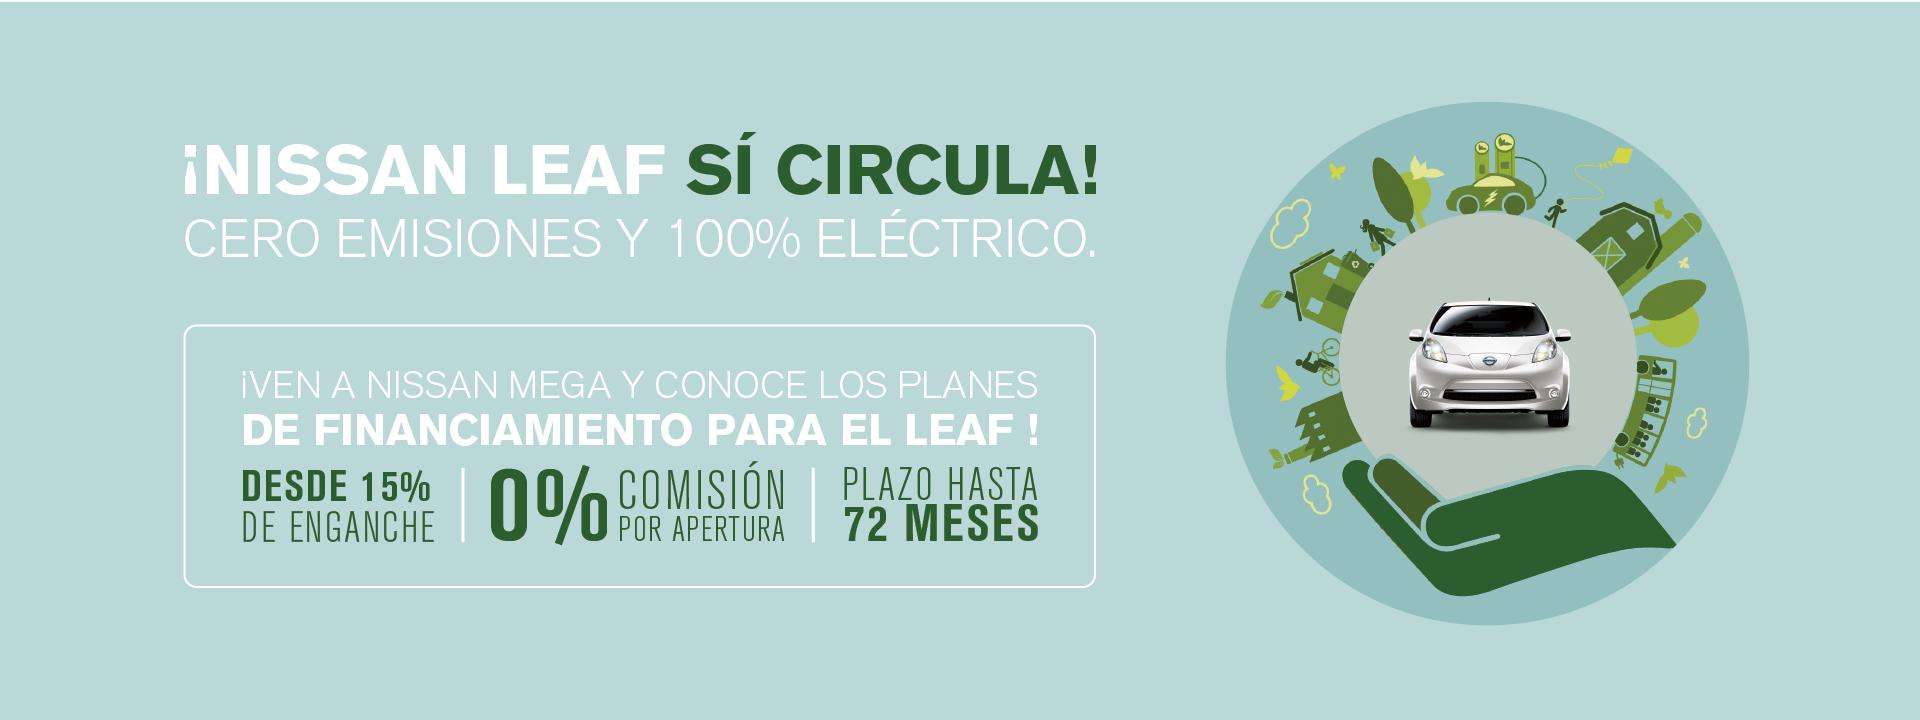 Nissan Leaf 100% electrico cero zero emision toluca calimaya zinacantepec metepec